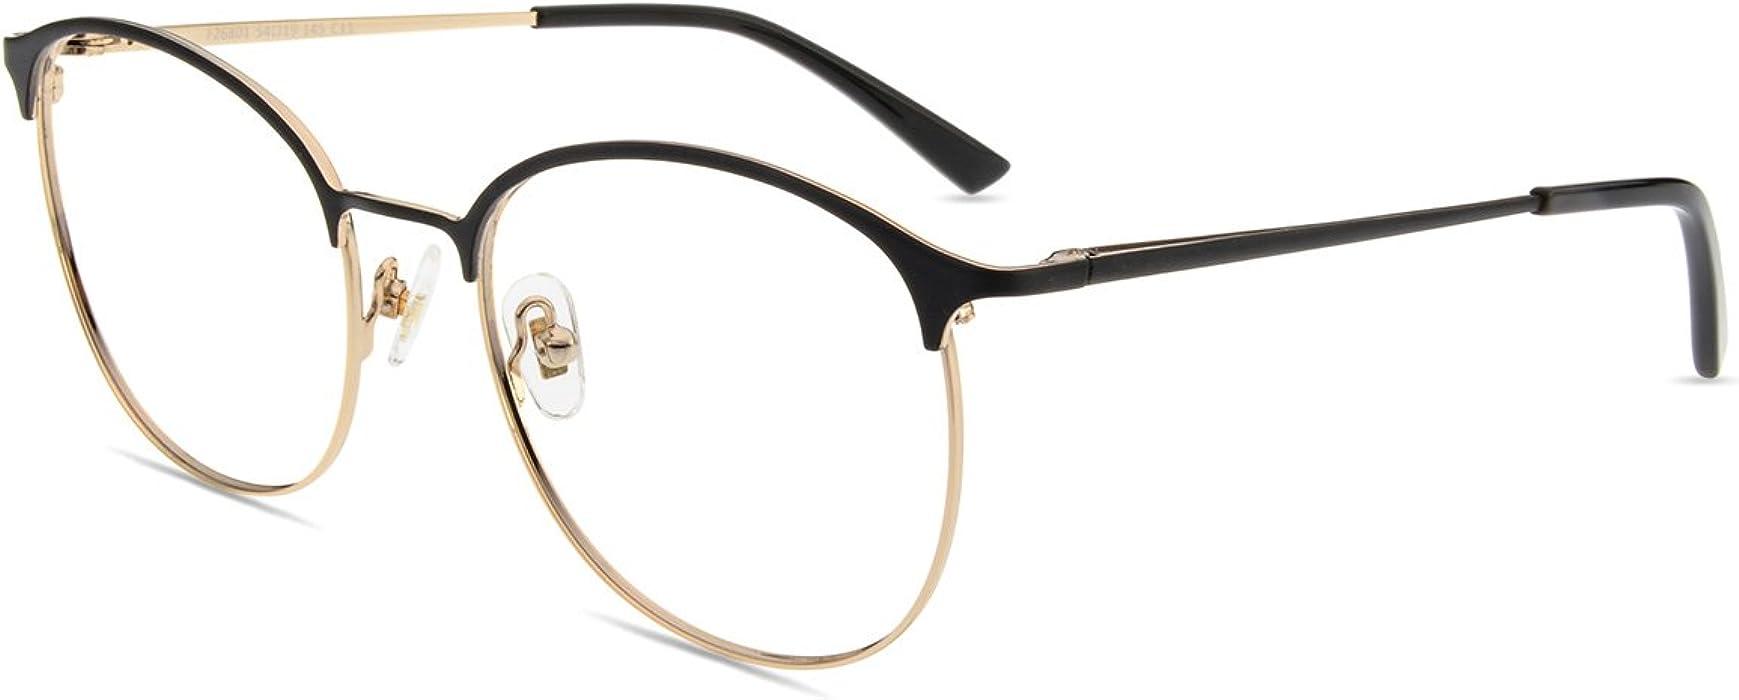 cf7cc3630b Firmoo Blue Light Blocking Computer Reading Glasses for Anti  Glare Eyestrain Headache with Stylish